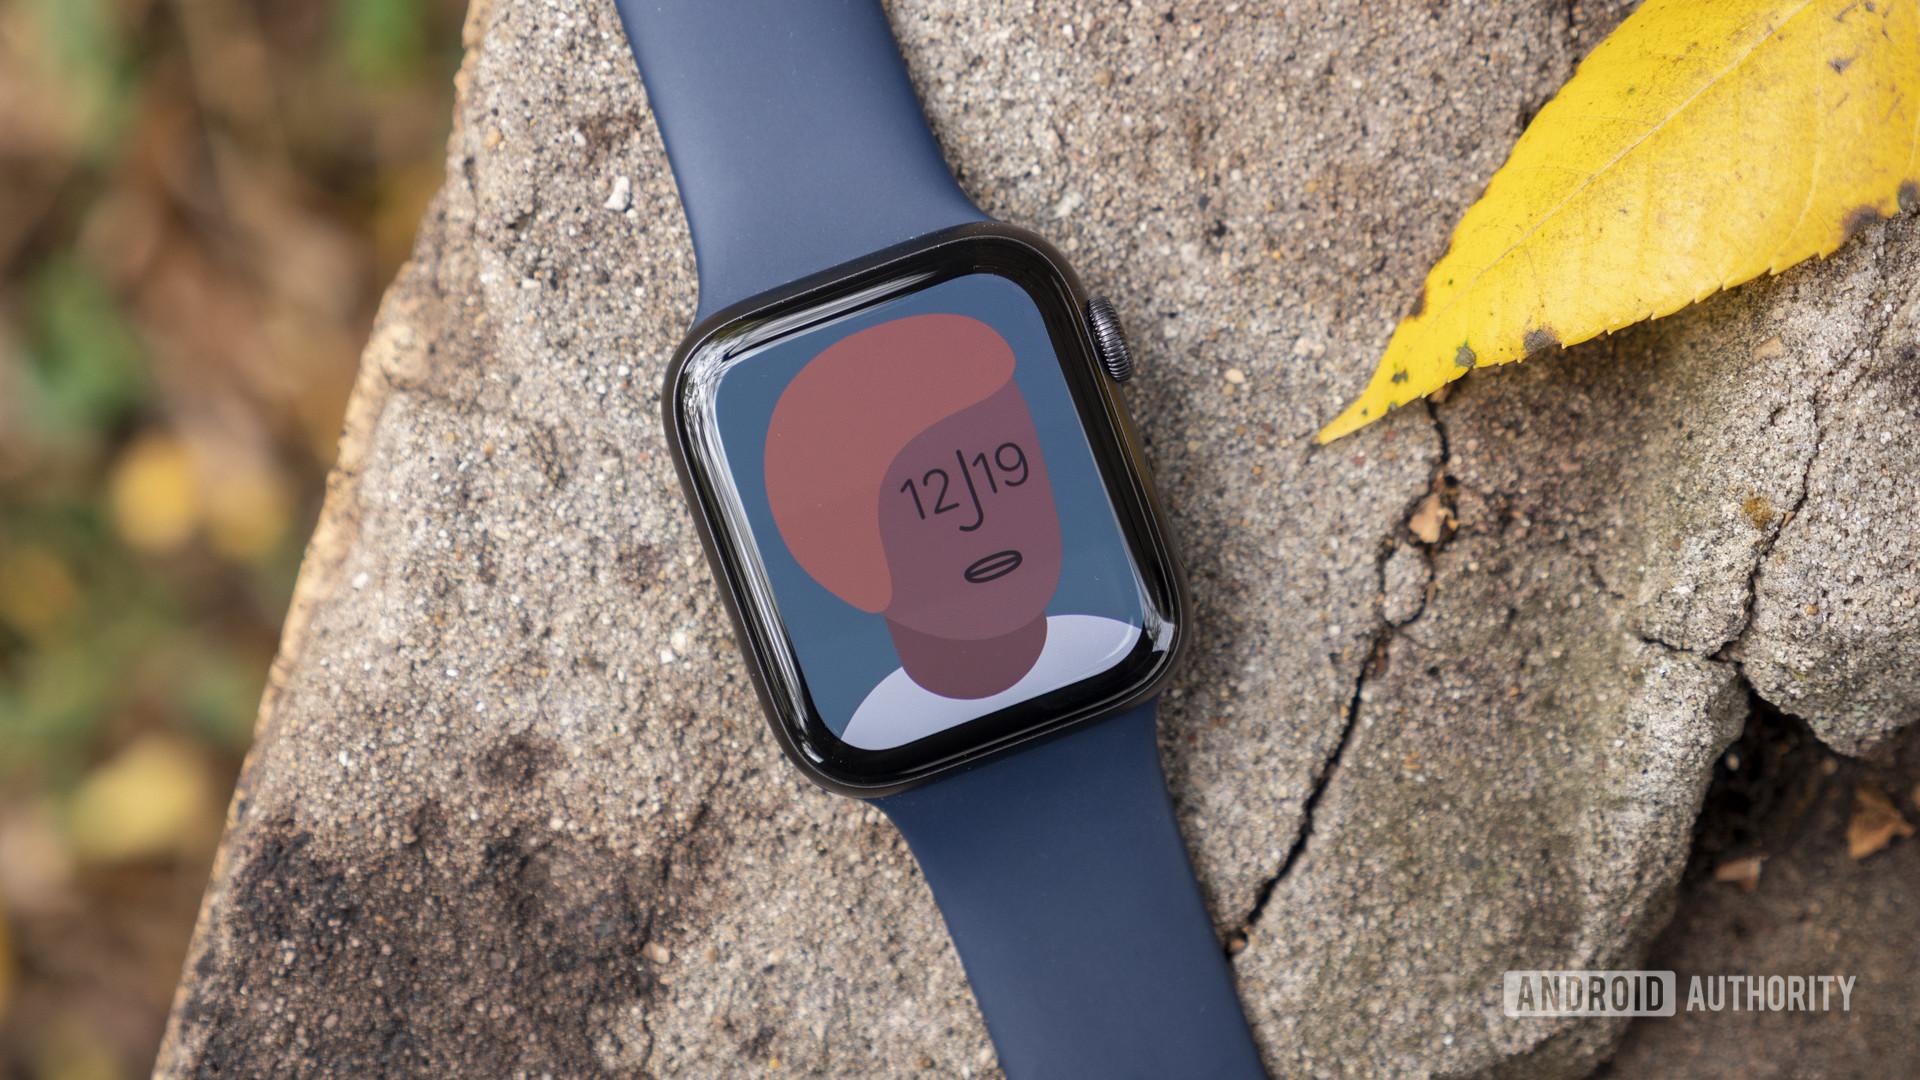 apple watch series 6 review artist watch face display 4